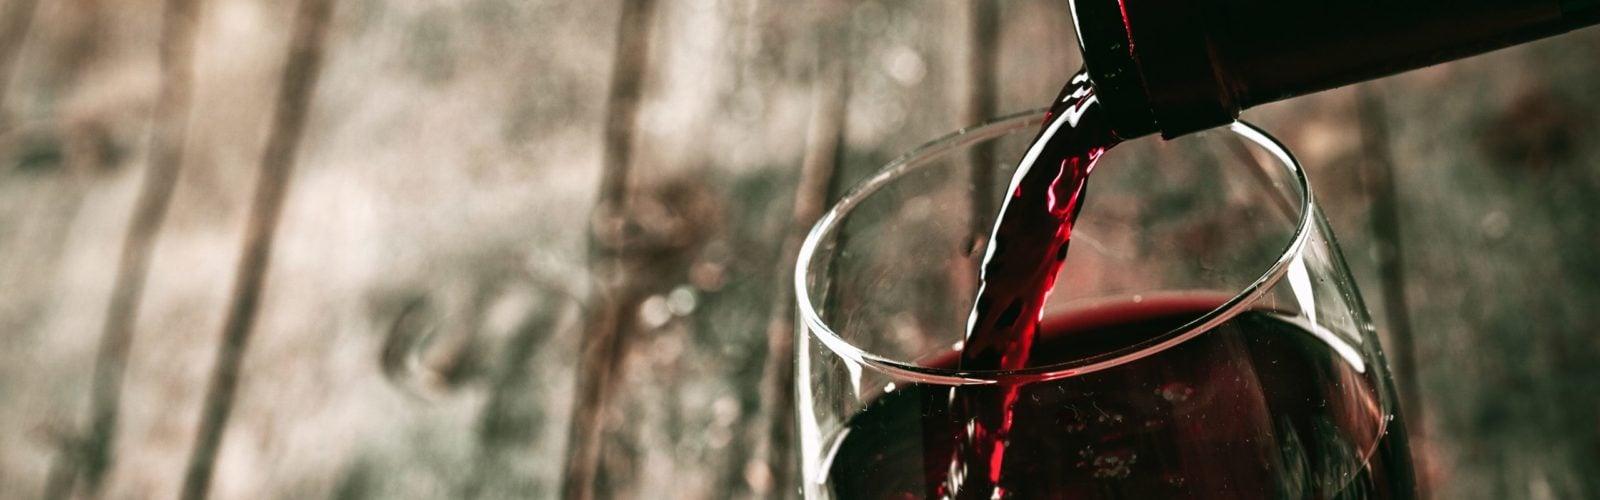 Red wine tasting Chile